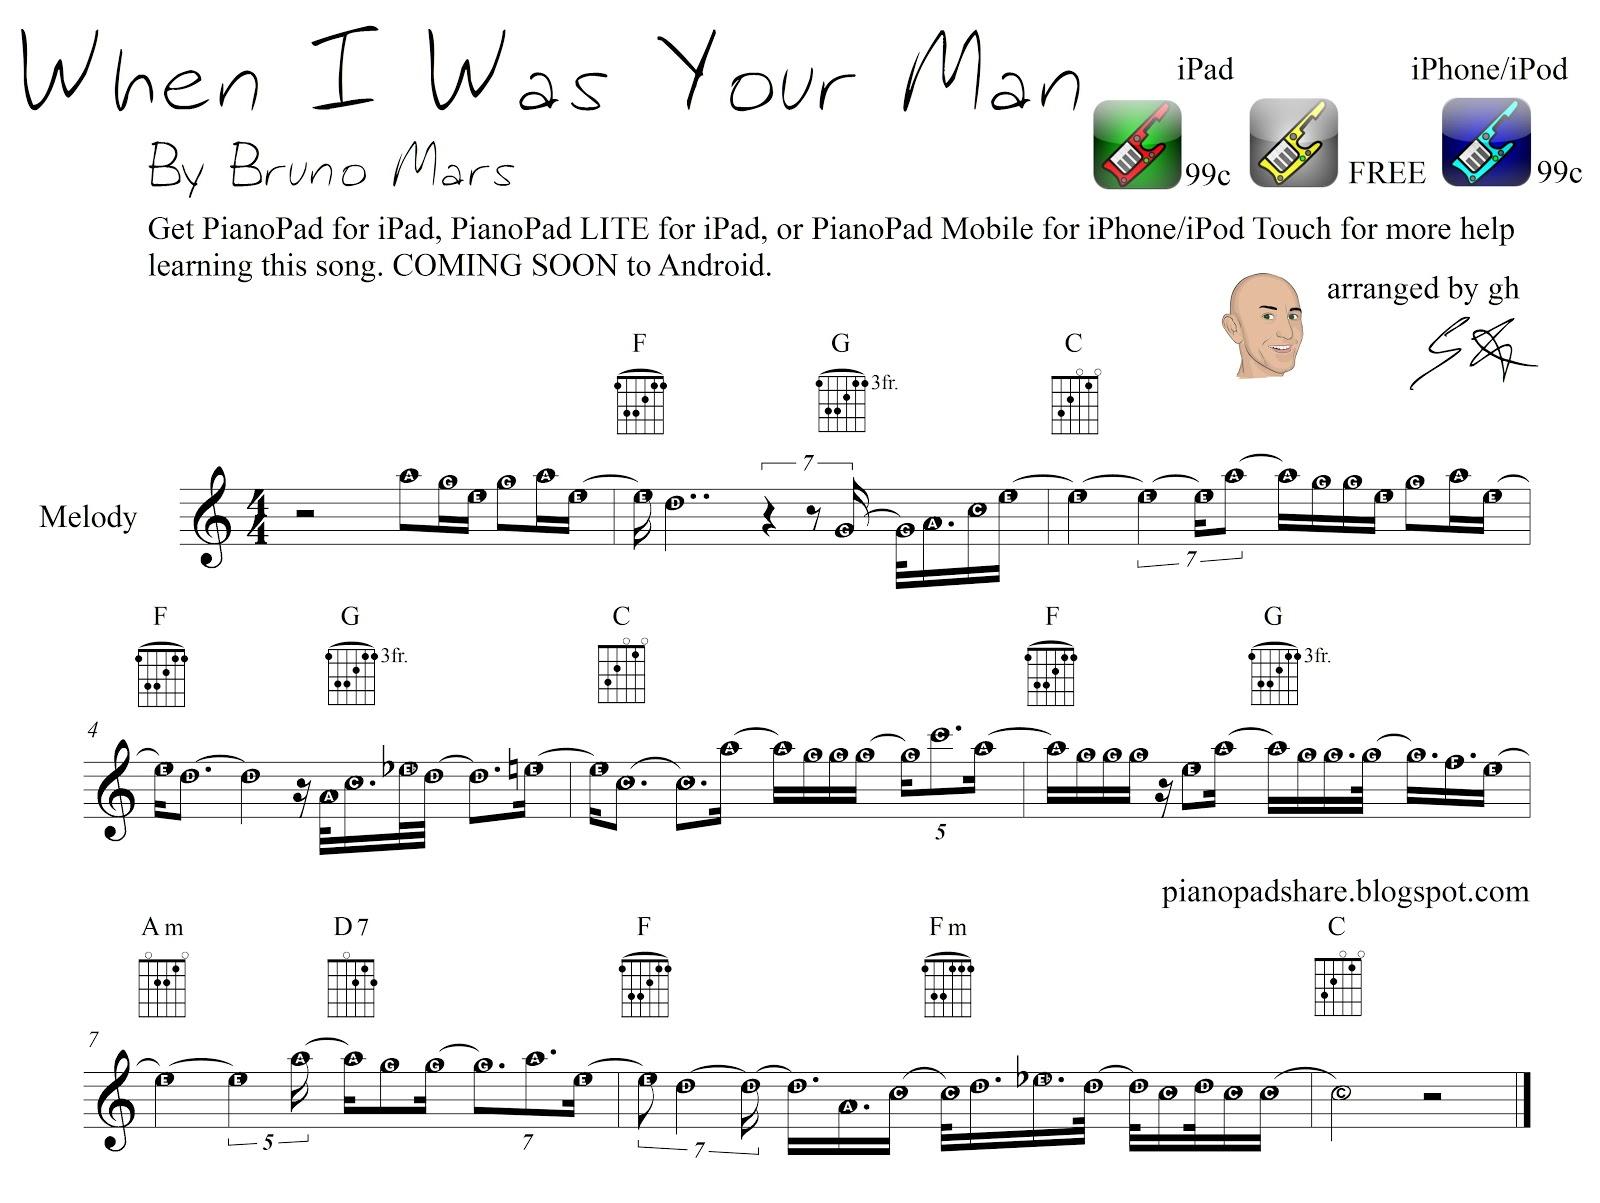 Bruno Mars When I Was Your Man Piano Sheet Music Free